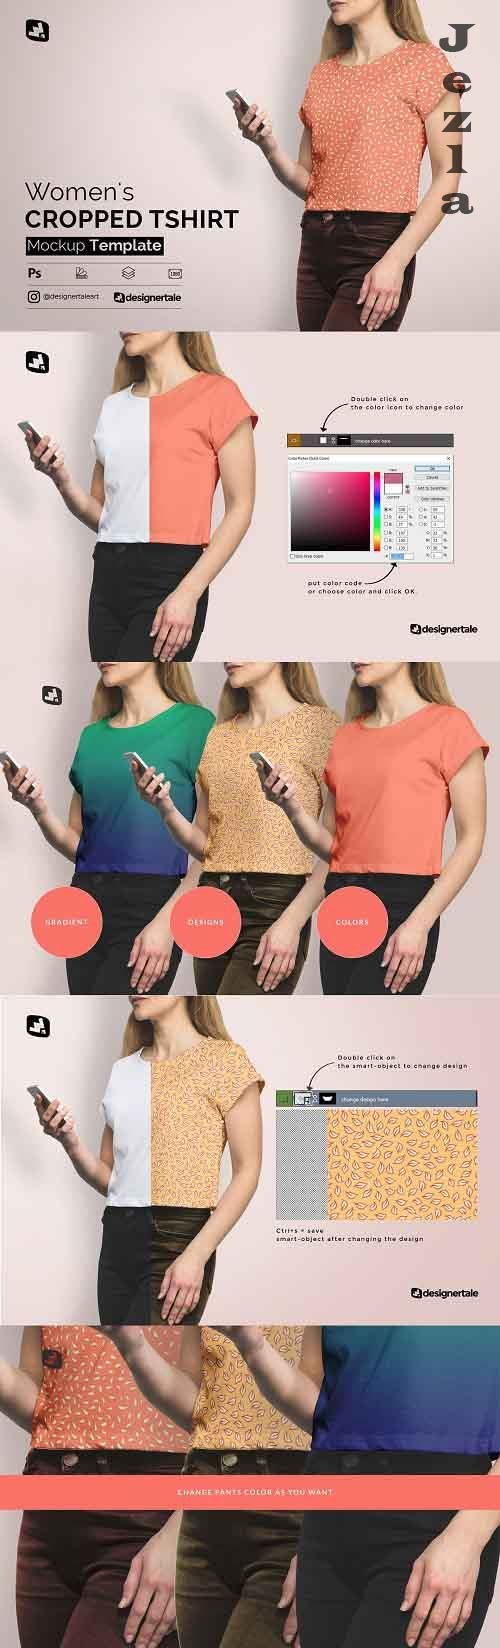 CreativeMarket - Women's Cropped Tshirt Mockup 4728864